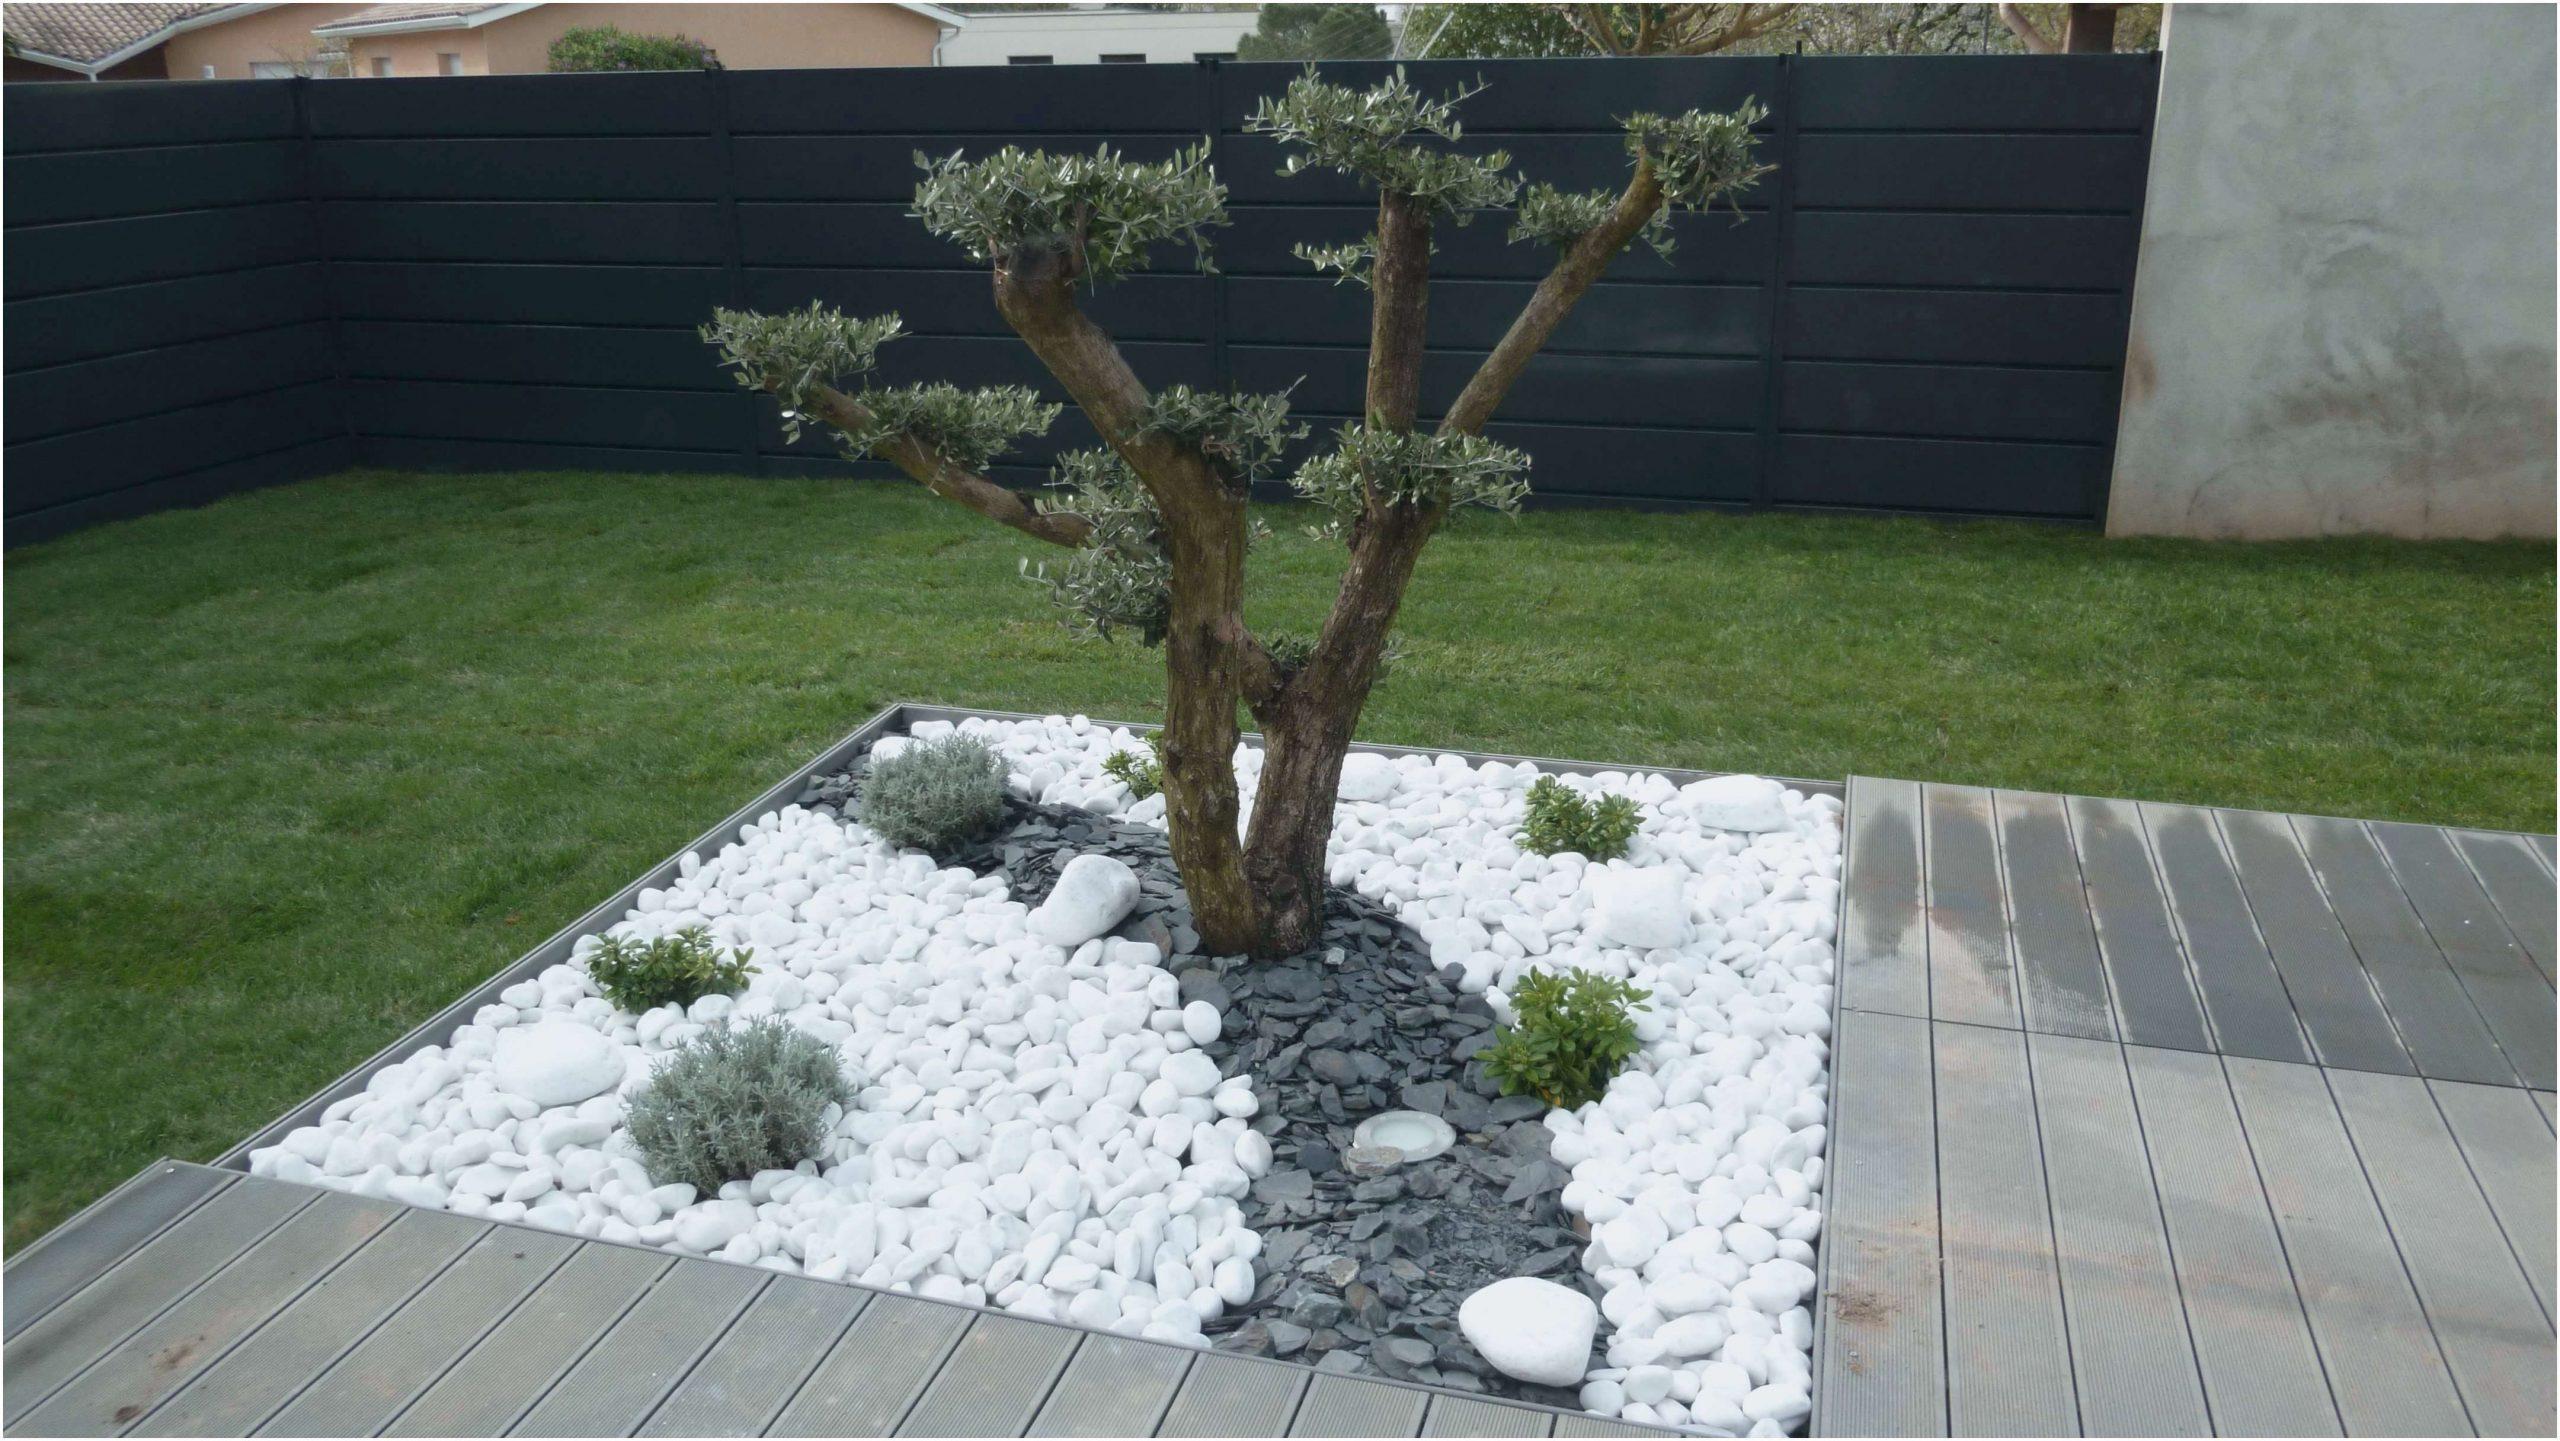 Idee Deco Jardin Avec Gravillon | Idee Deco Jardin ... avec Idee Deco Jardin Gravier